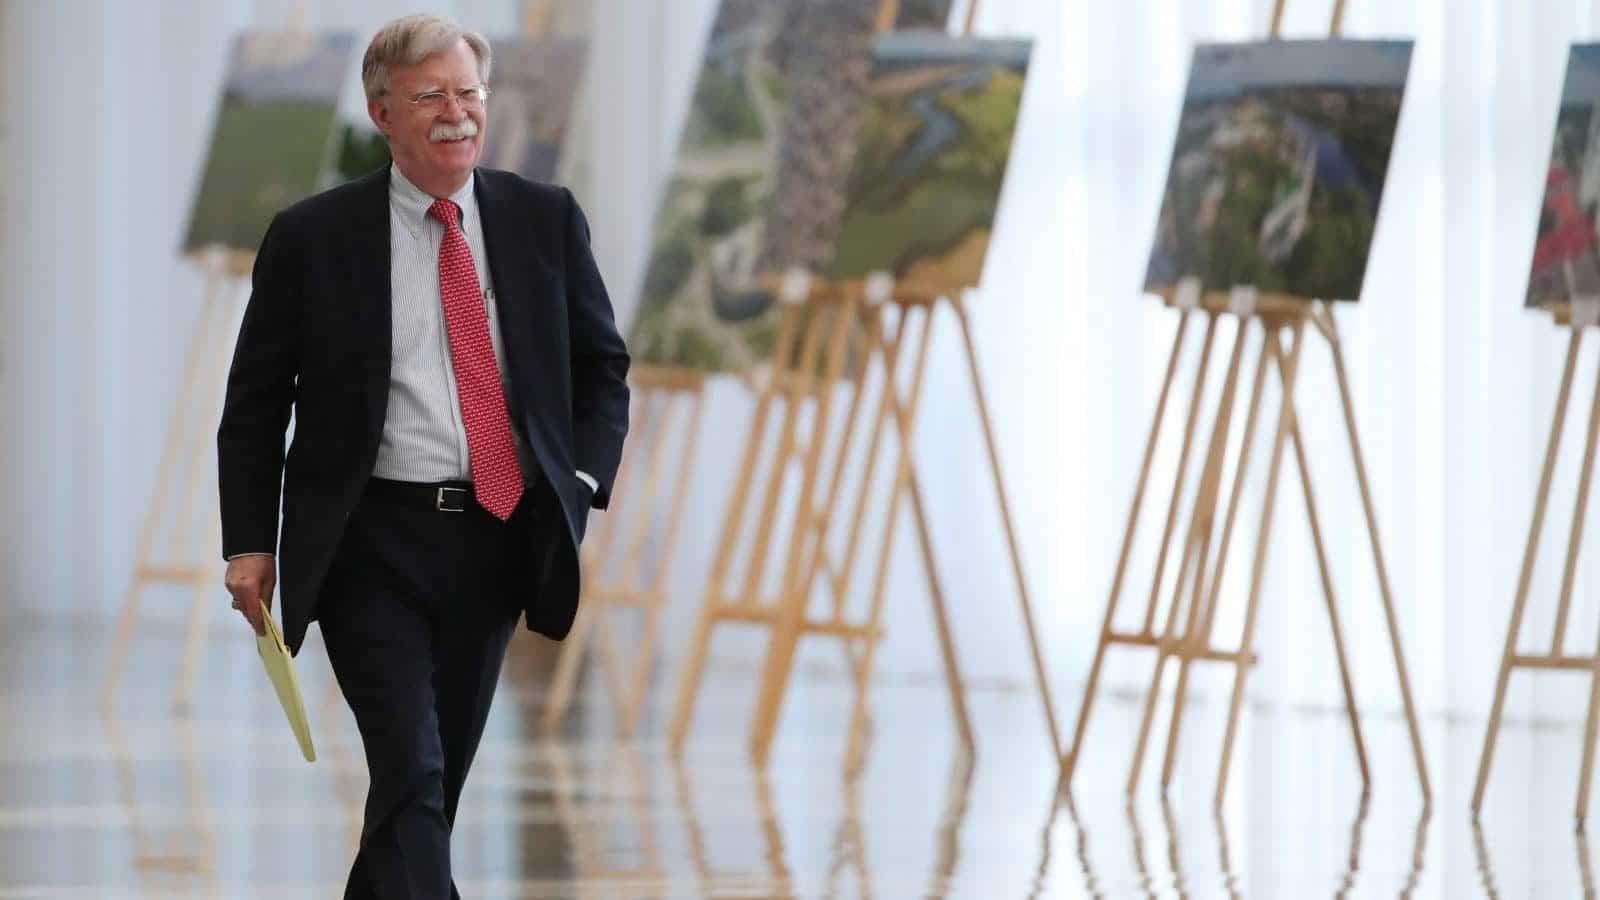 Bolton Sacking Raises Hopes – and Fears – in Balkans | Balkan Insight